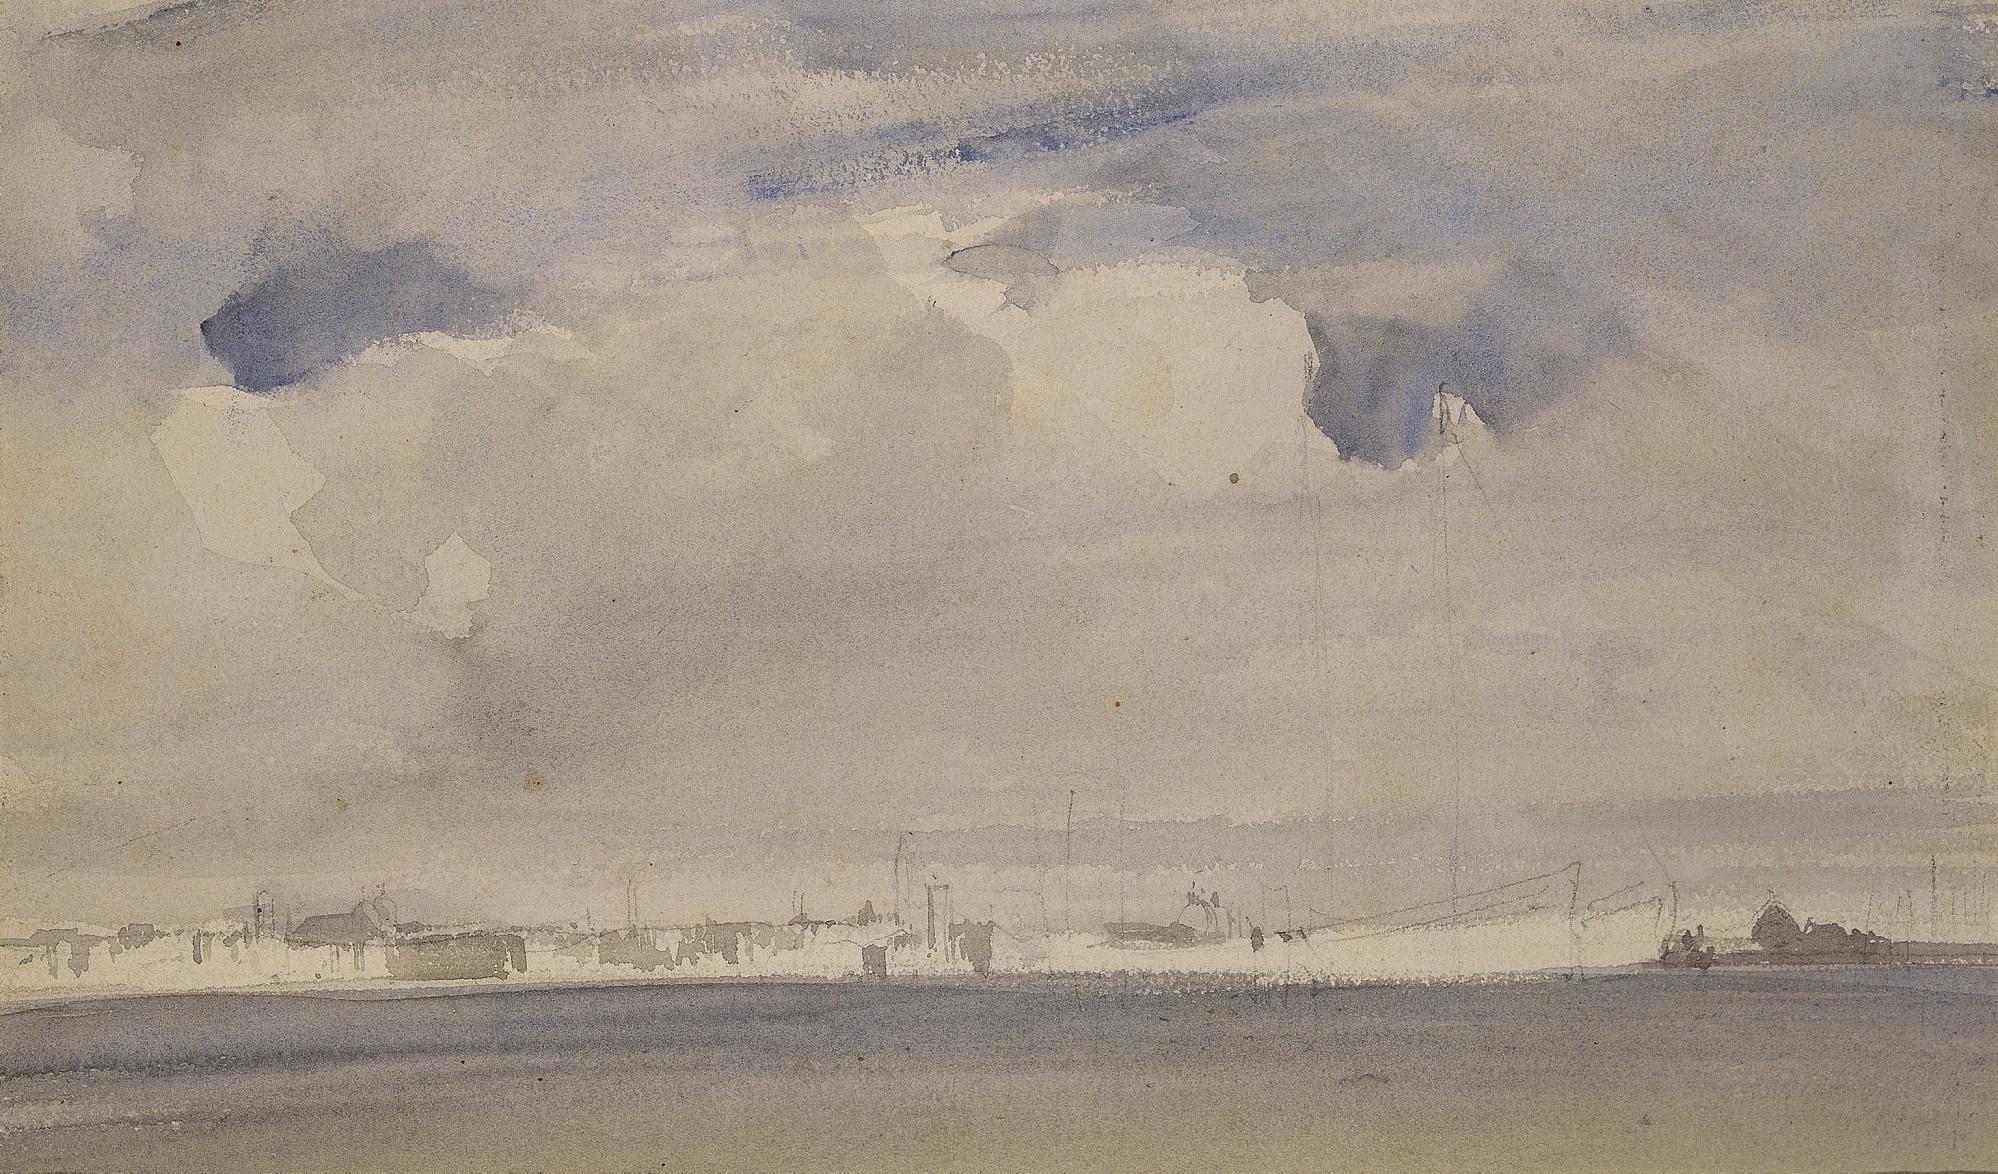 Le quai de Schiavoni, vu depuis l'île de San Giorgio Maggiore